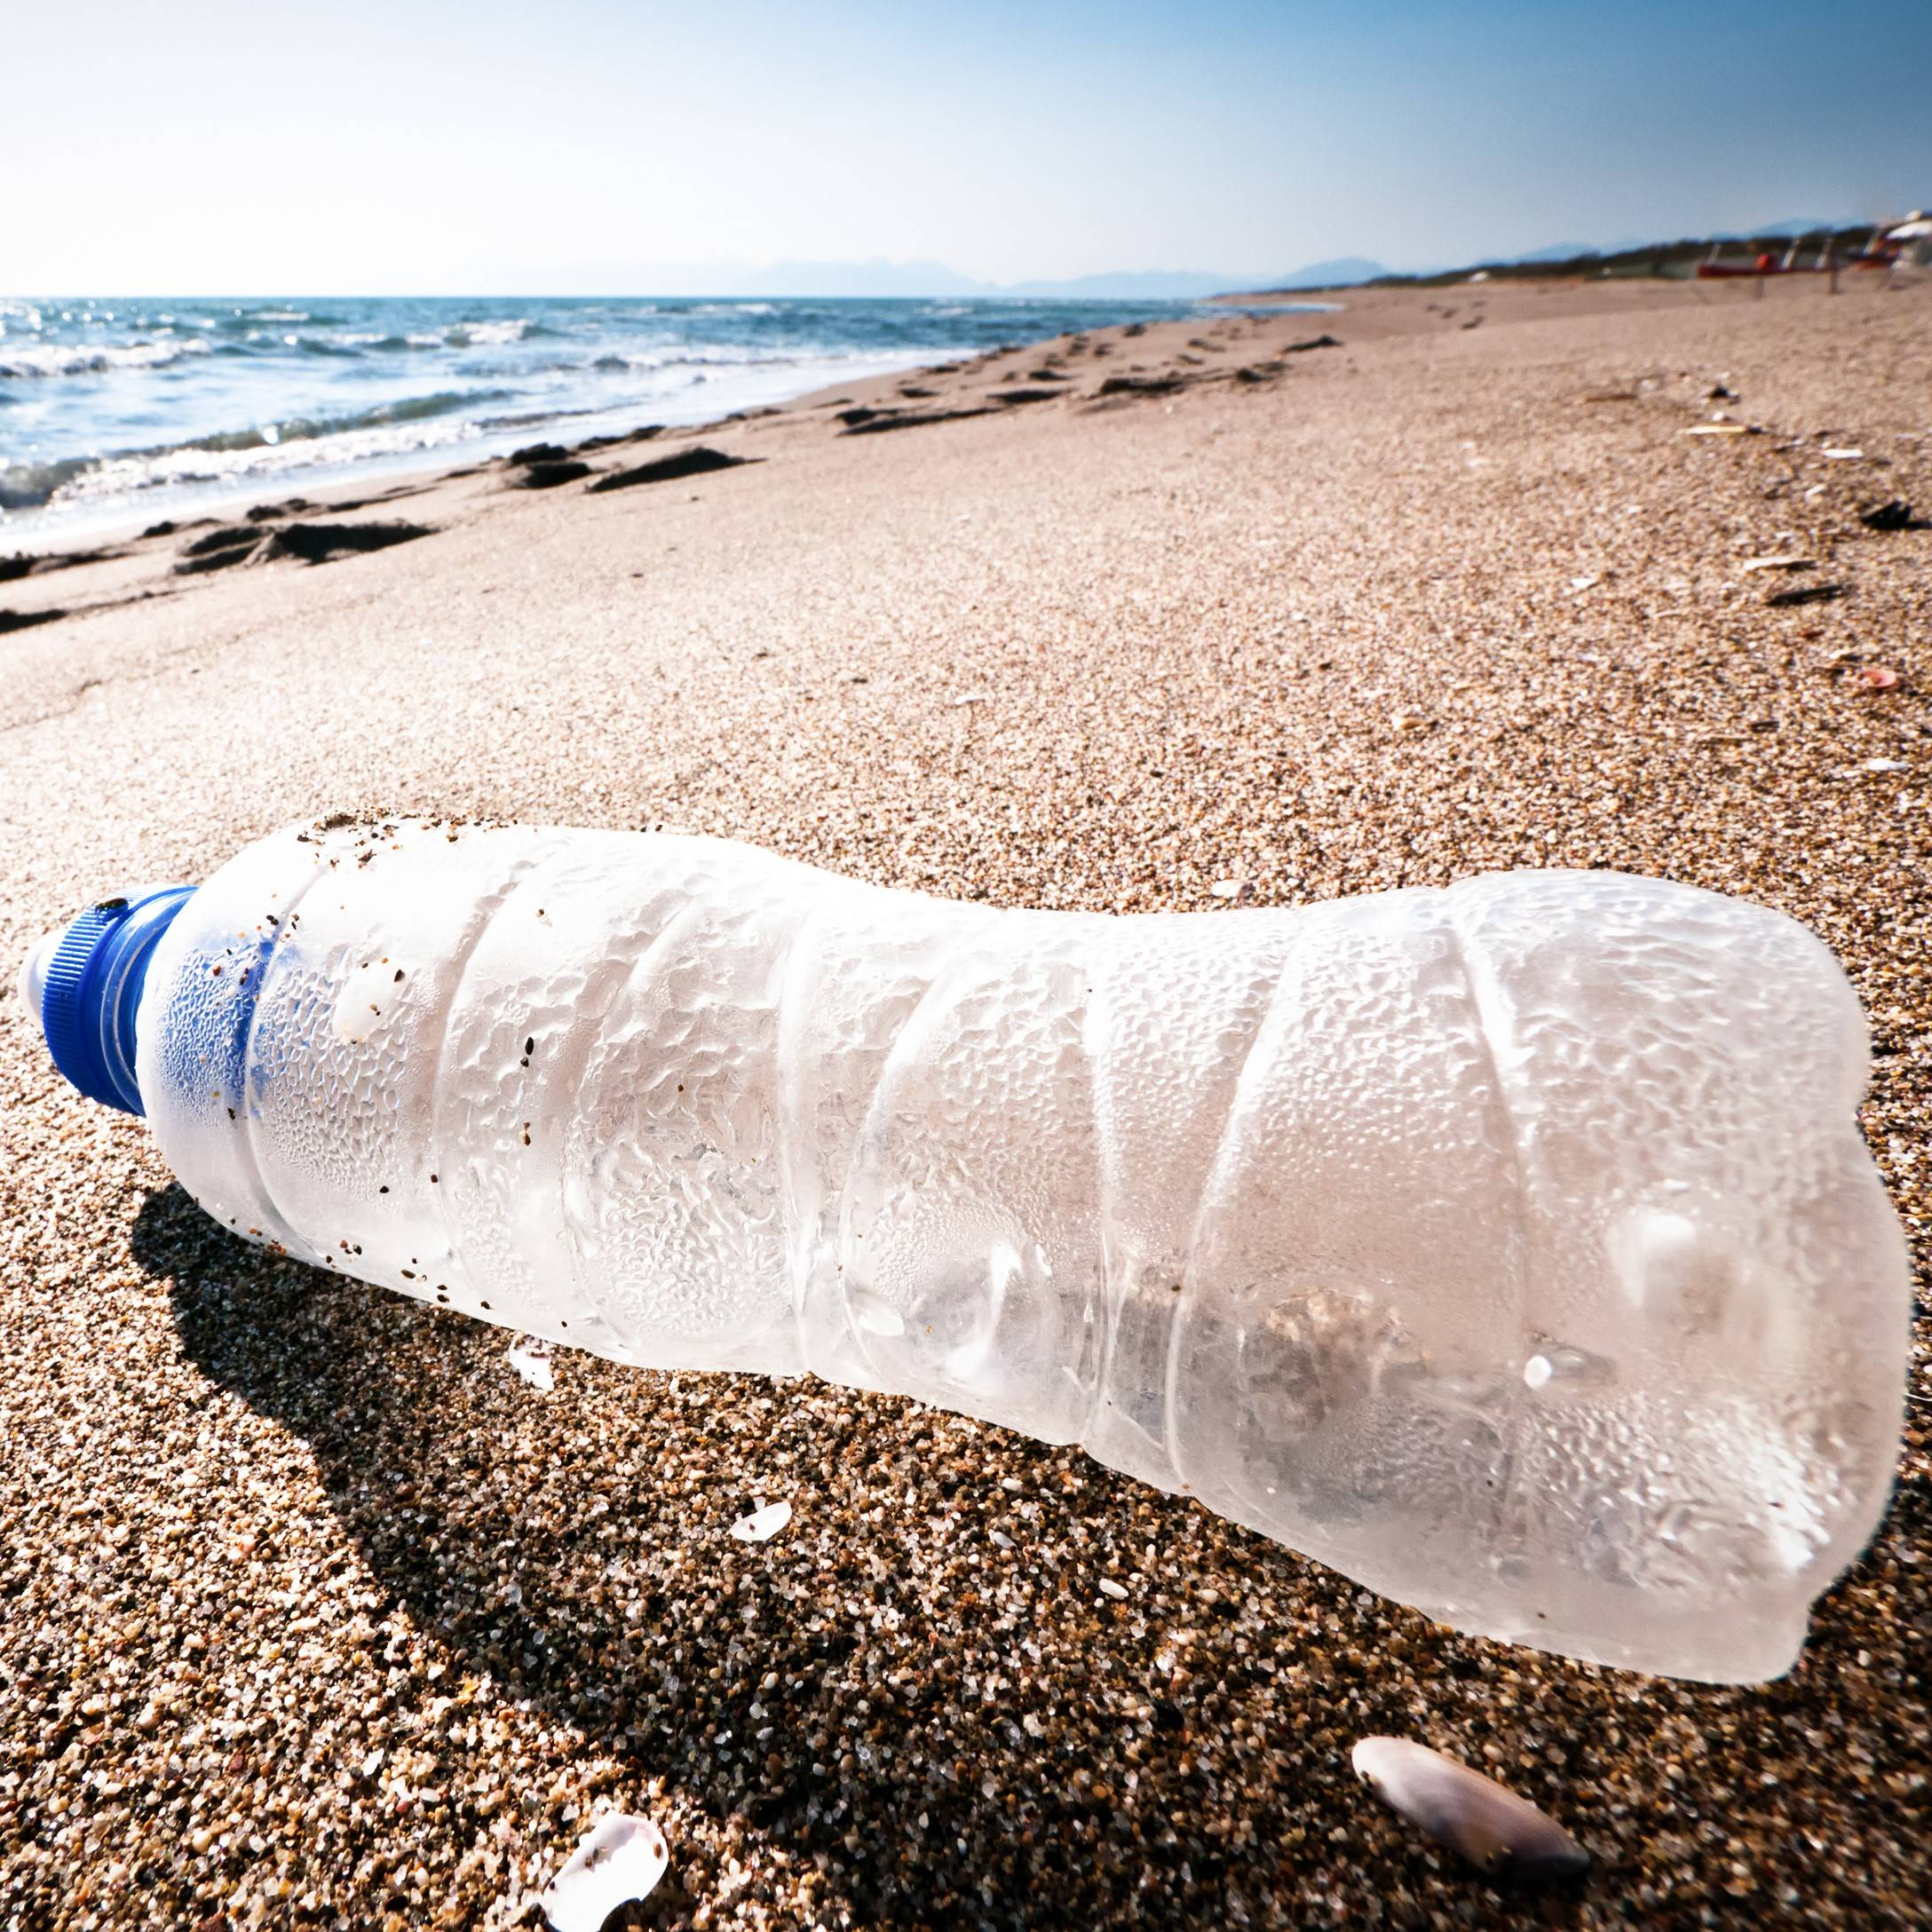 Plastic bottle washed up on beach